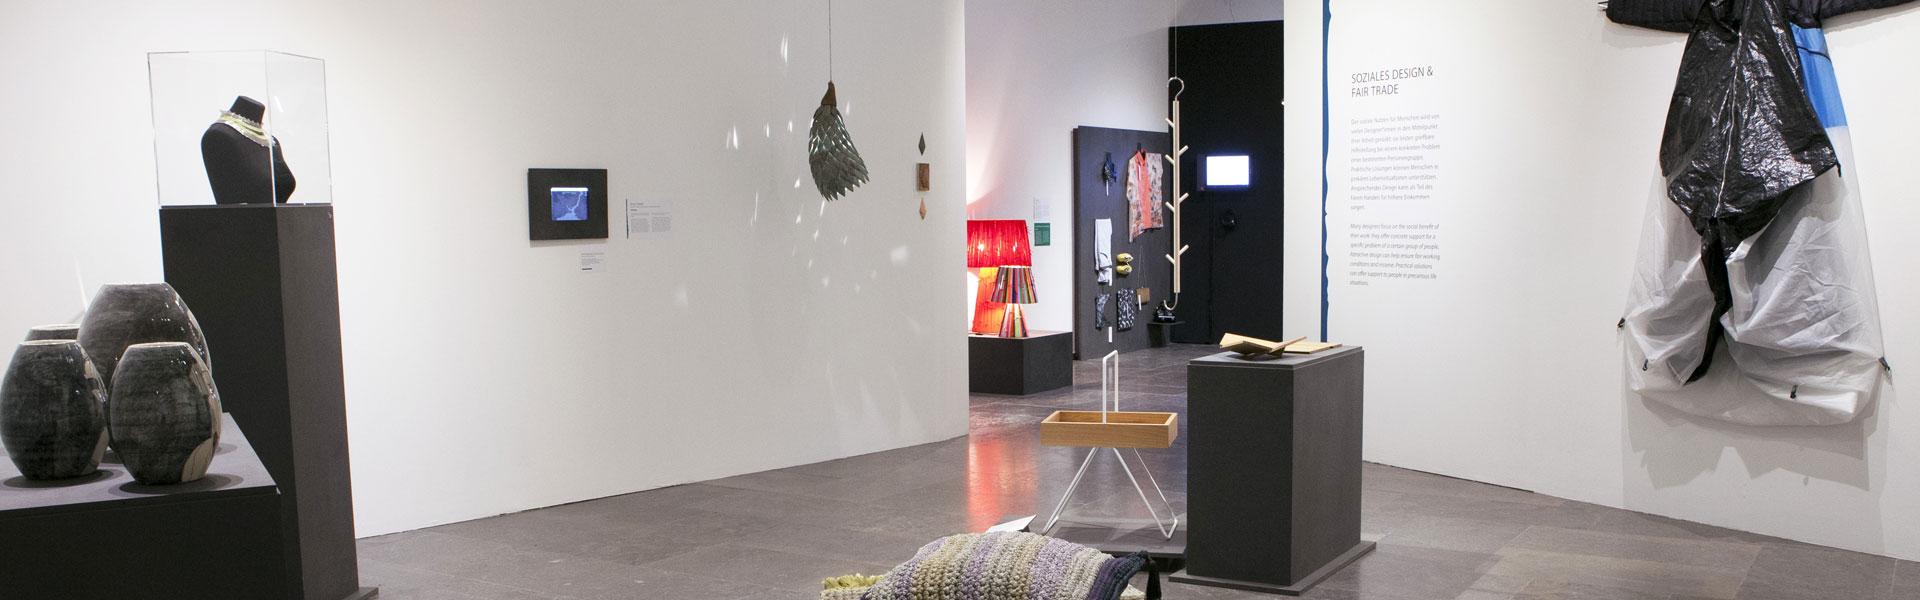 ökoRAUSCH Ausstellung 2017